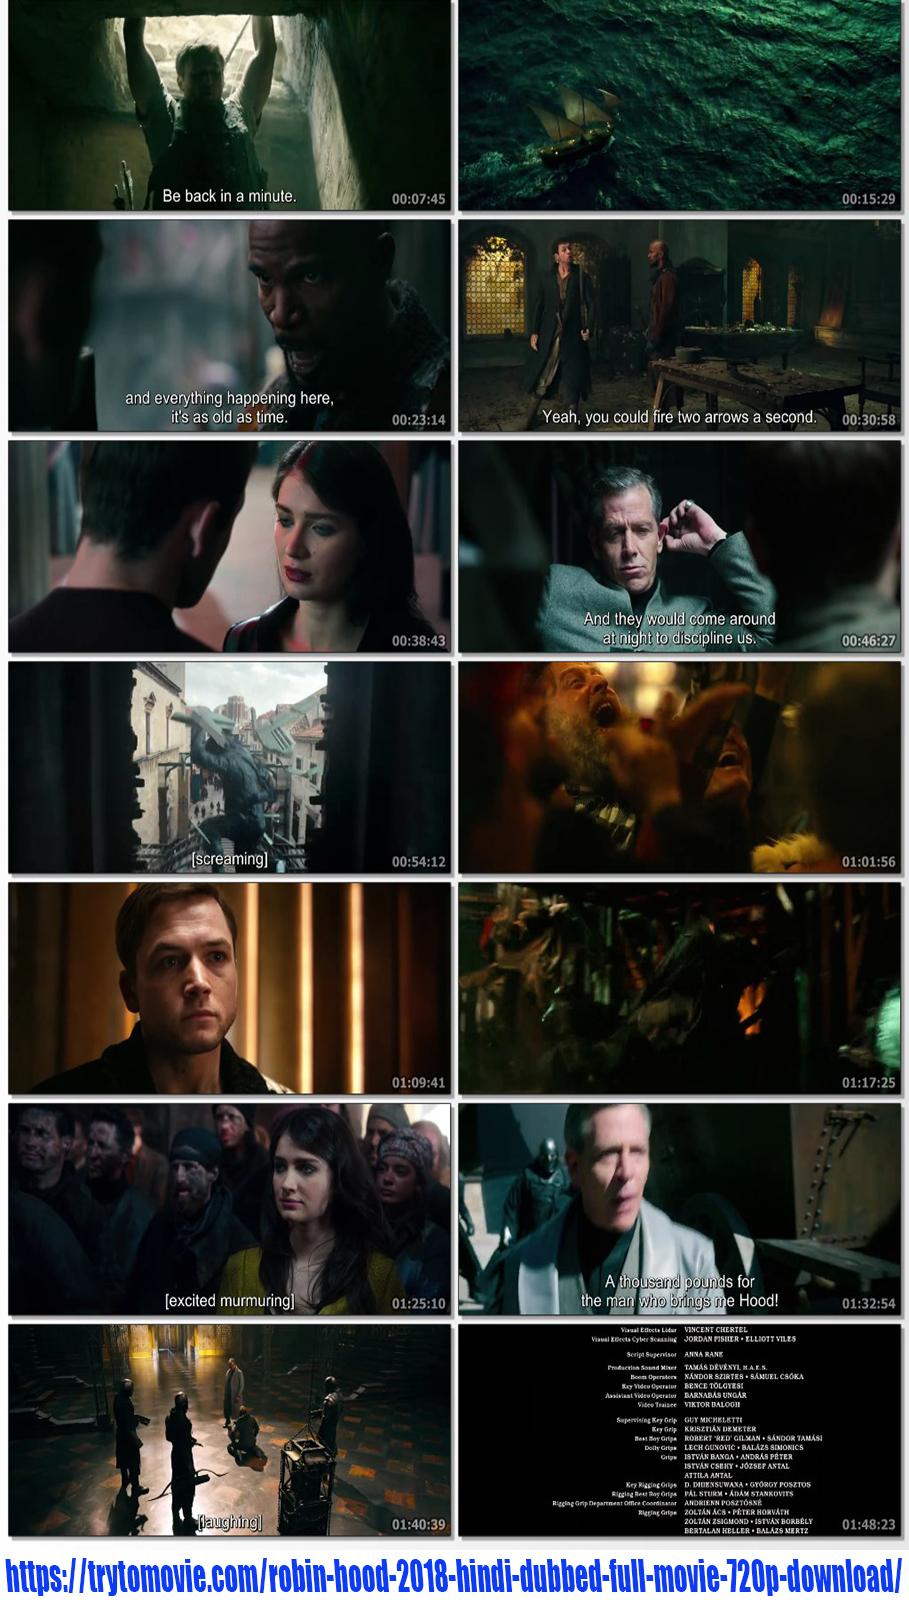 Robin Hood 2018 Hindi Dubbed Full Movie 720p Download